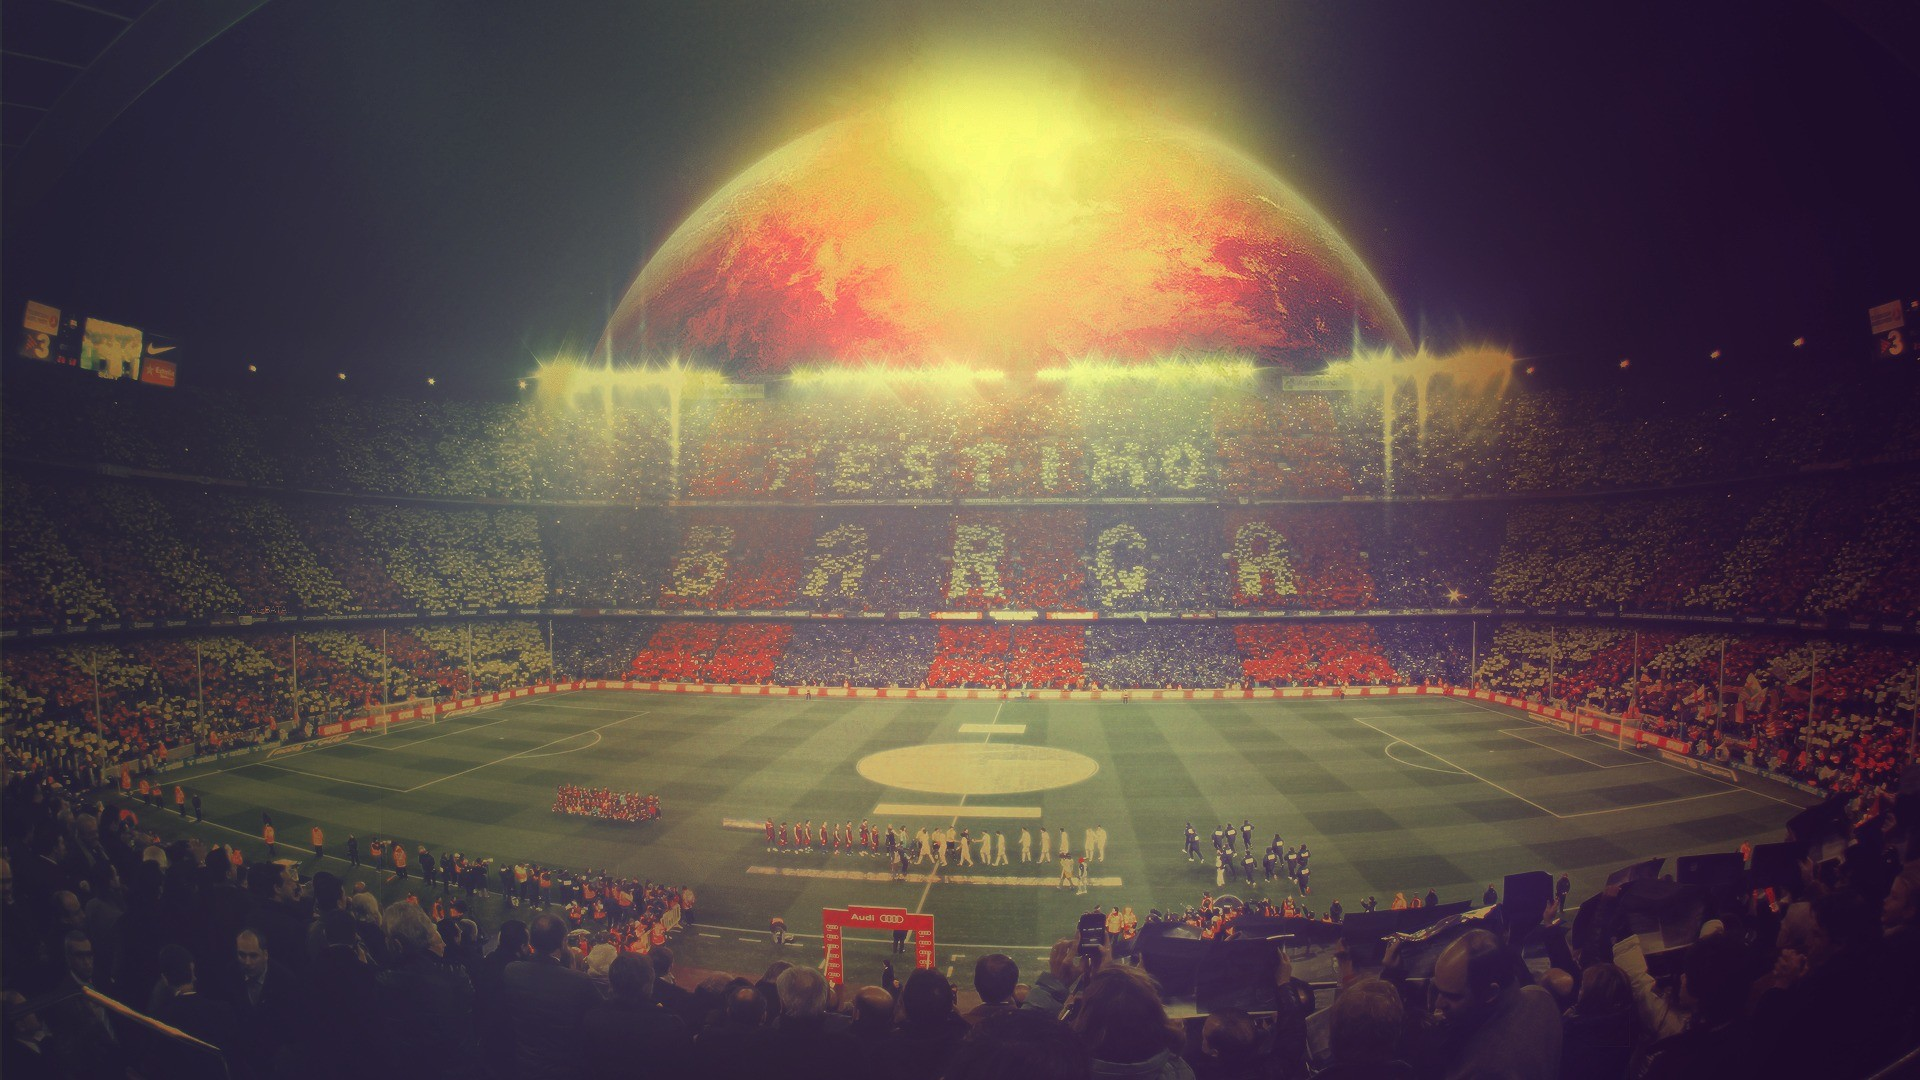 FC Barcelona stadium, the Camp Nou wallpaper in 2013-2014